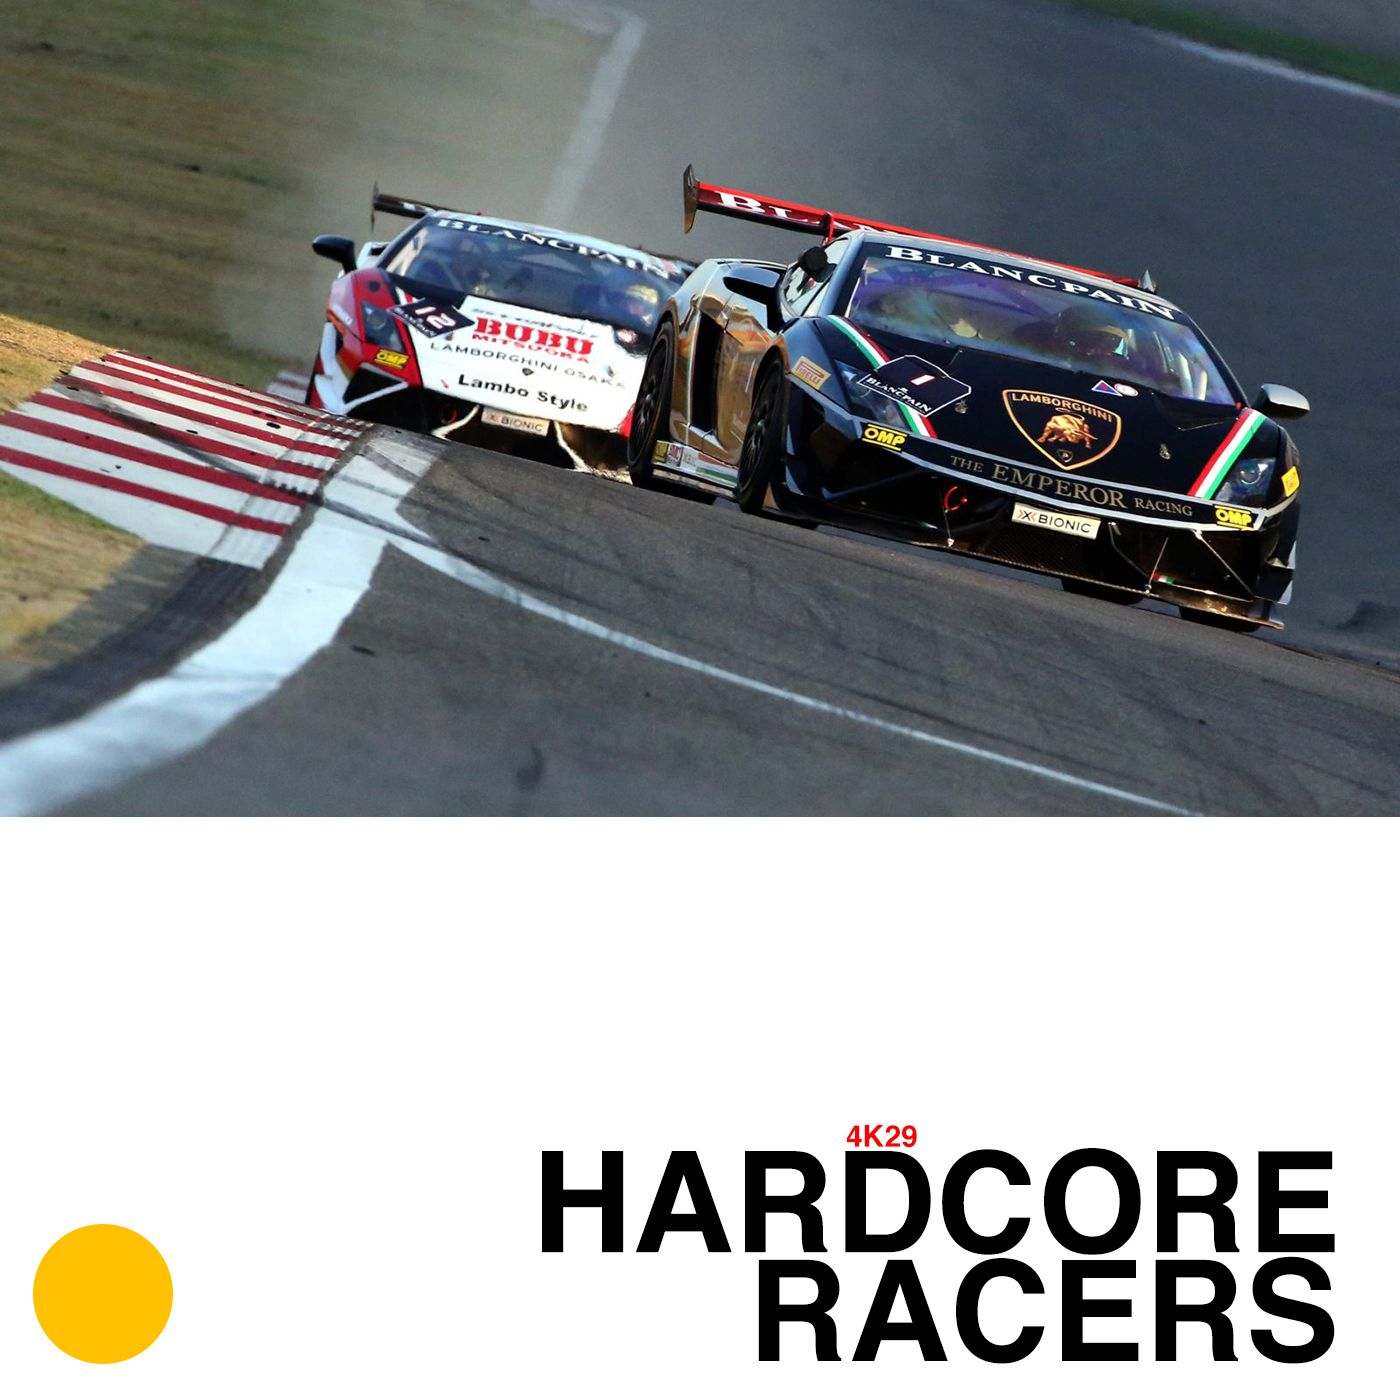 HARDCORE RACERS 4K29